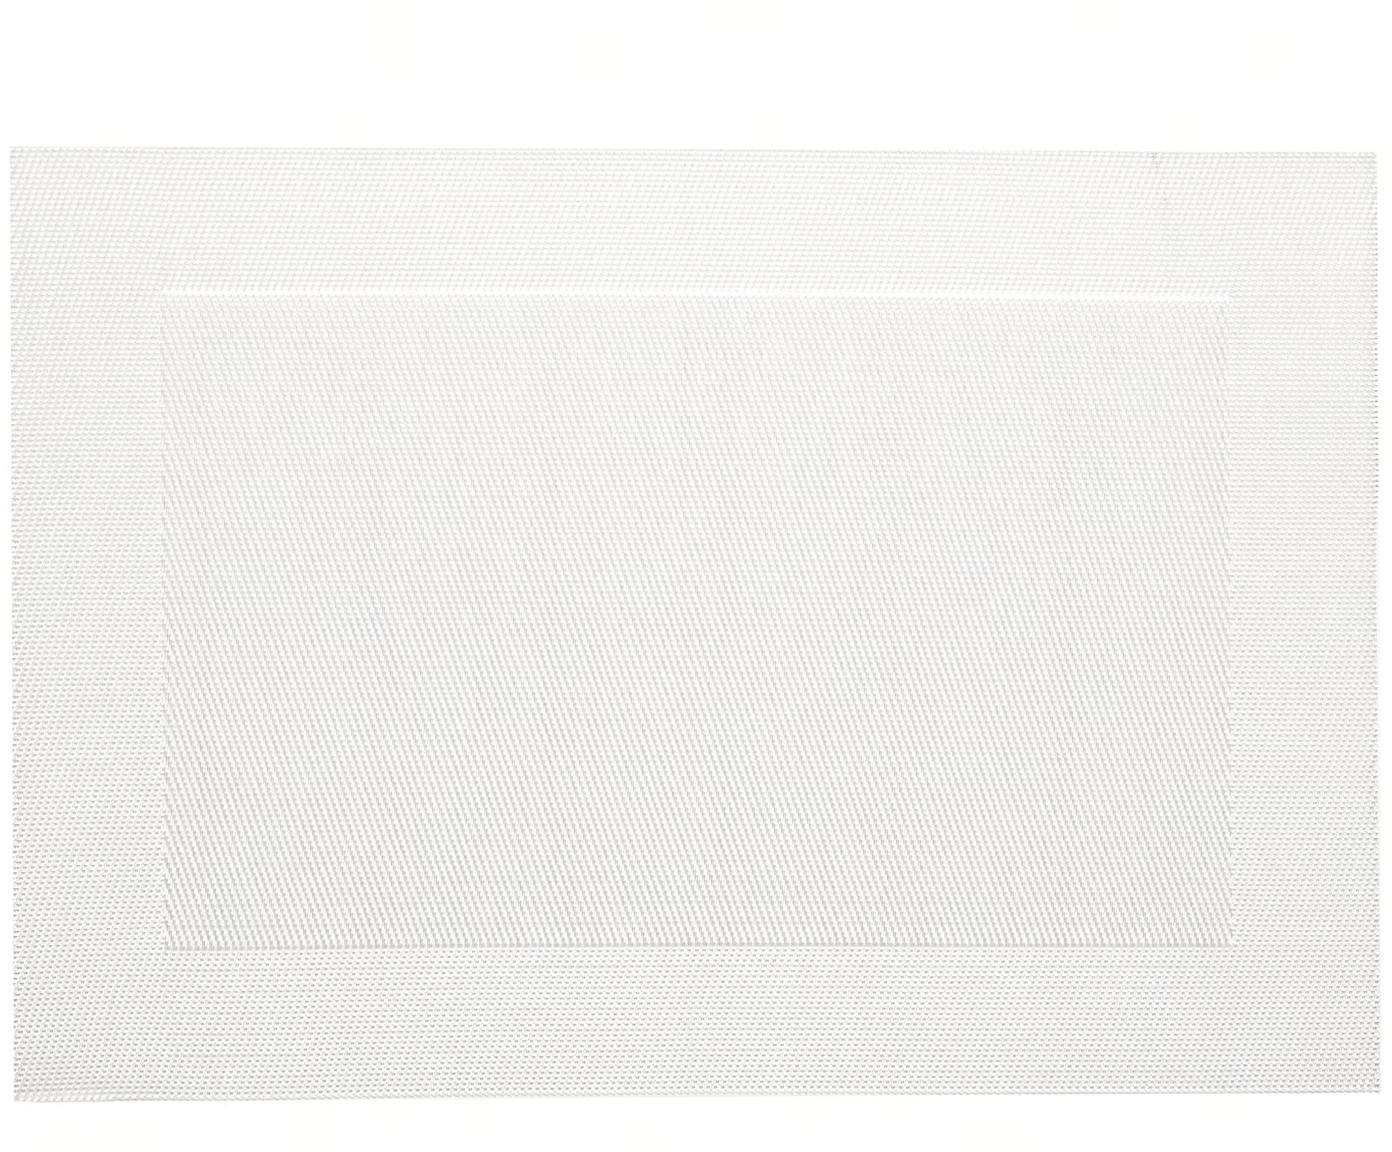 Kunststof placemat Modern, 2 stuks, Kunststof, Parelmoer, 33 x 46 cm